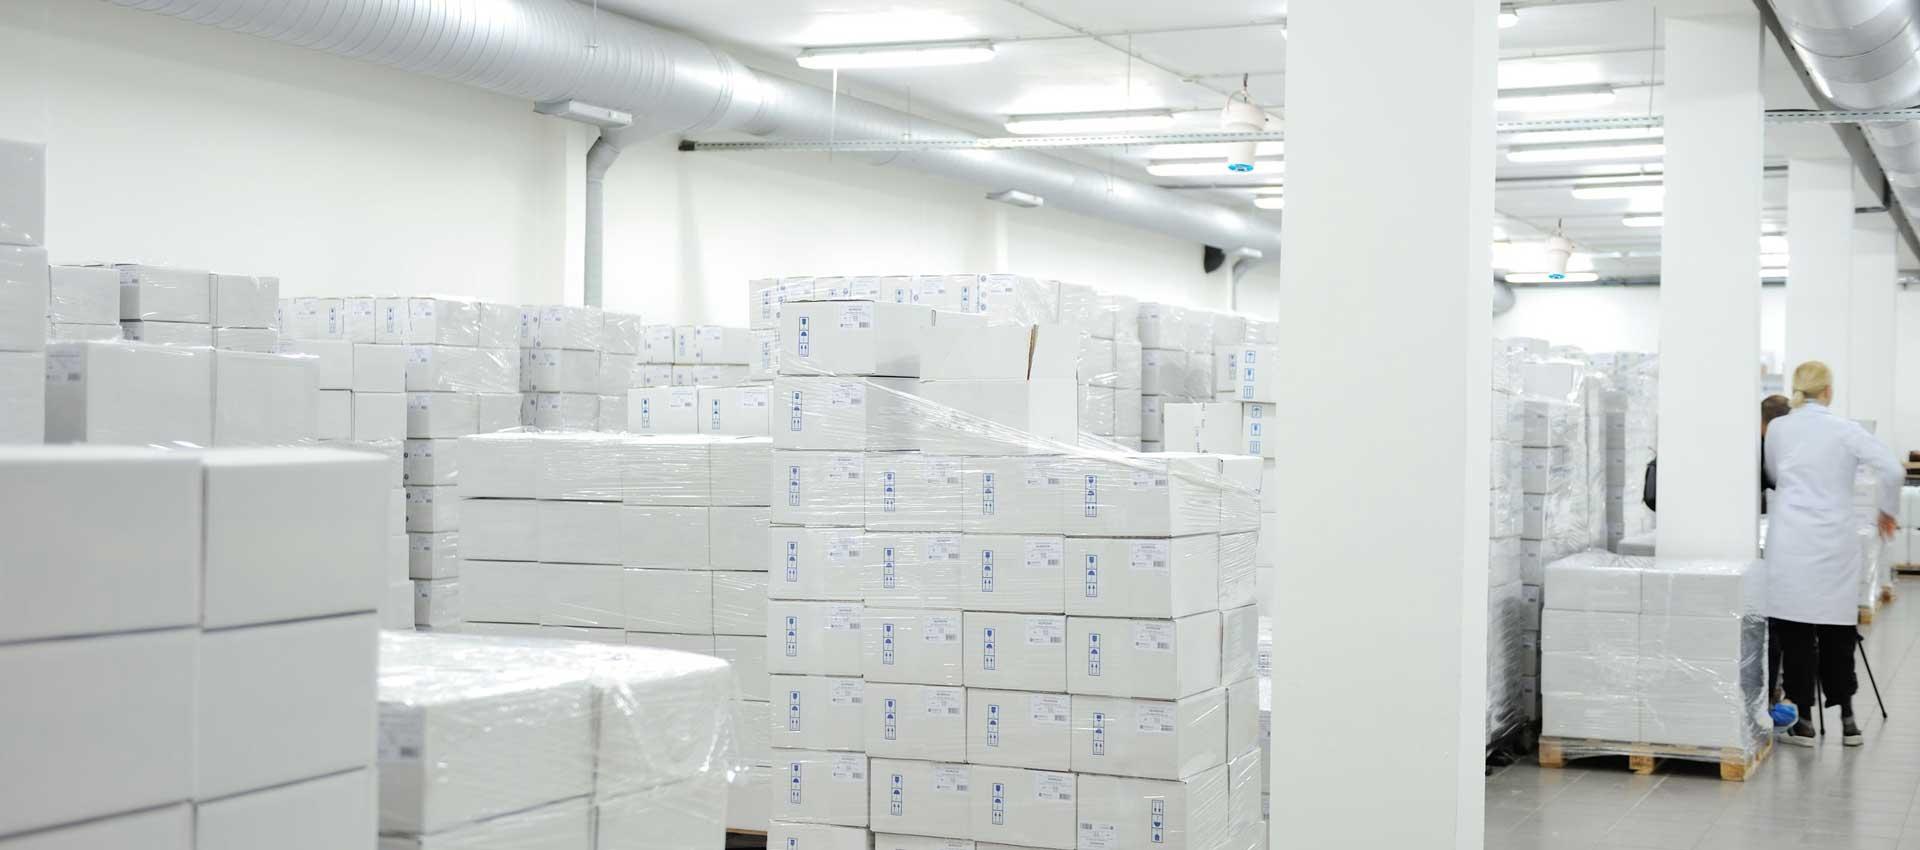 Airius PureAir Air Purification System Installed In Pharmaceutical Warehouse